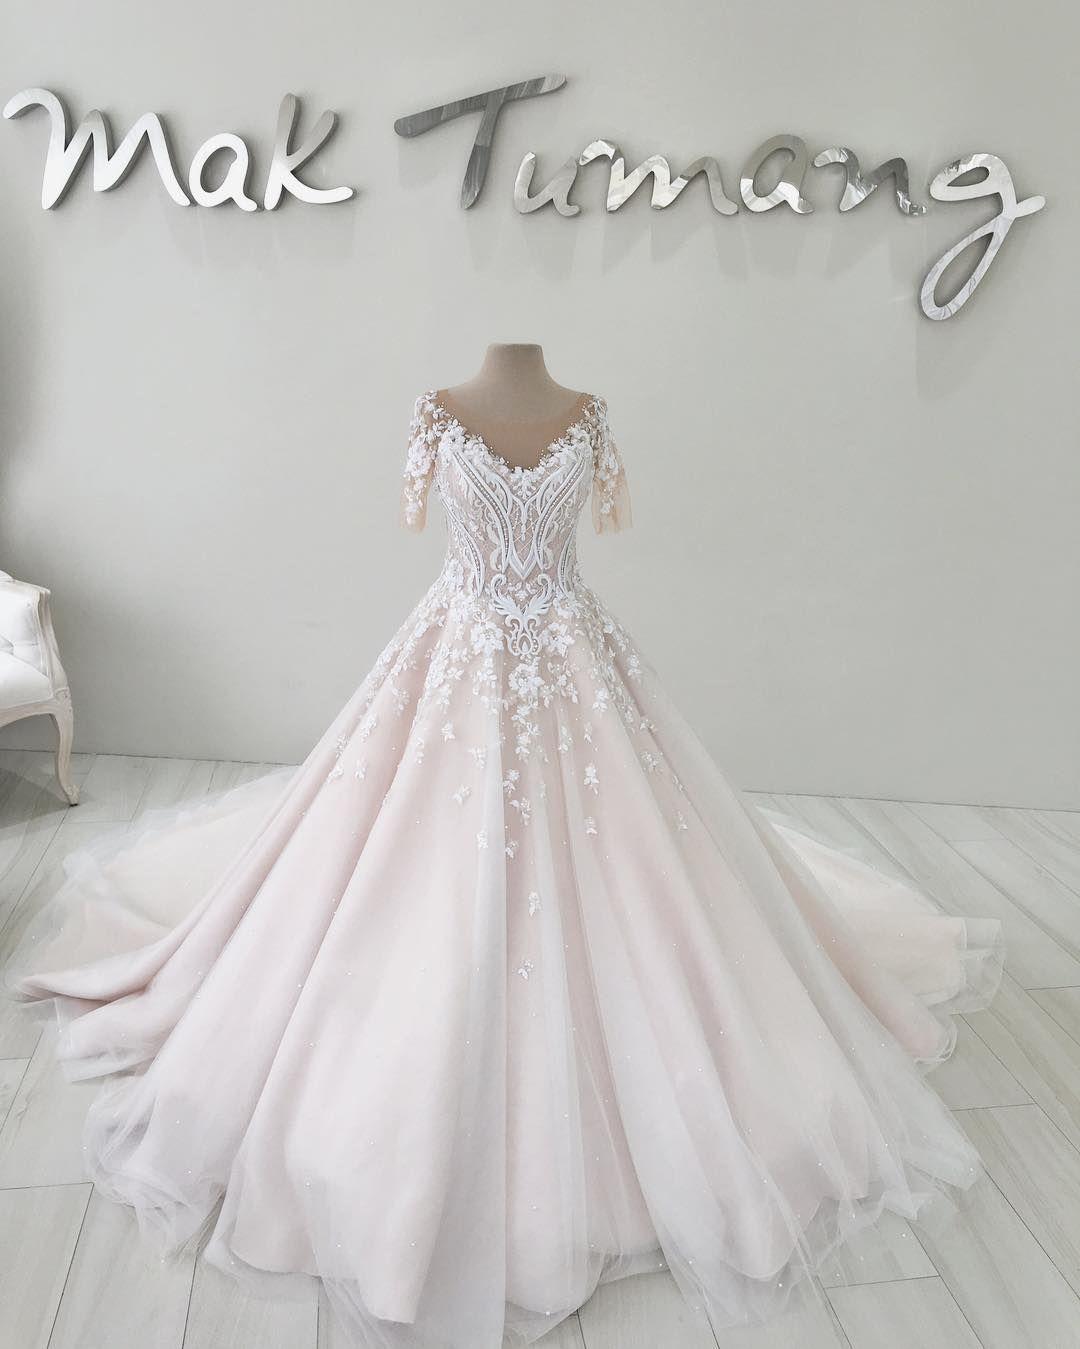 May Maktumang Wedding Wedding Dresses Fancy Dresses Birthday